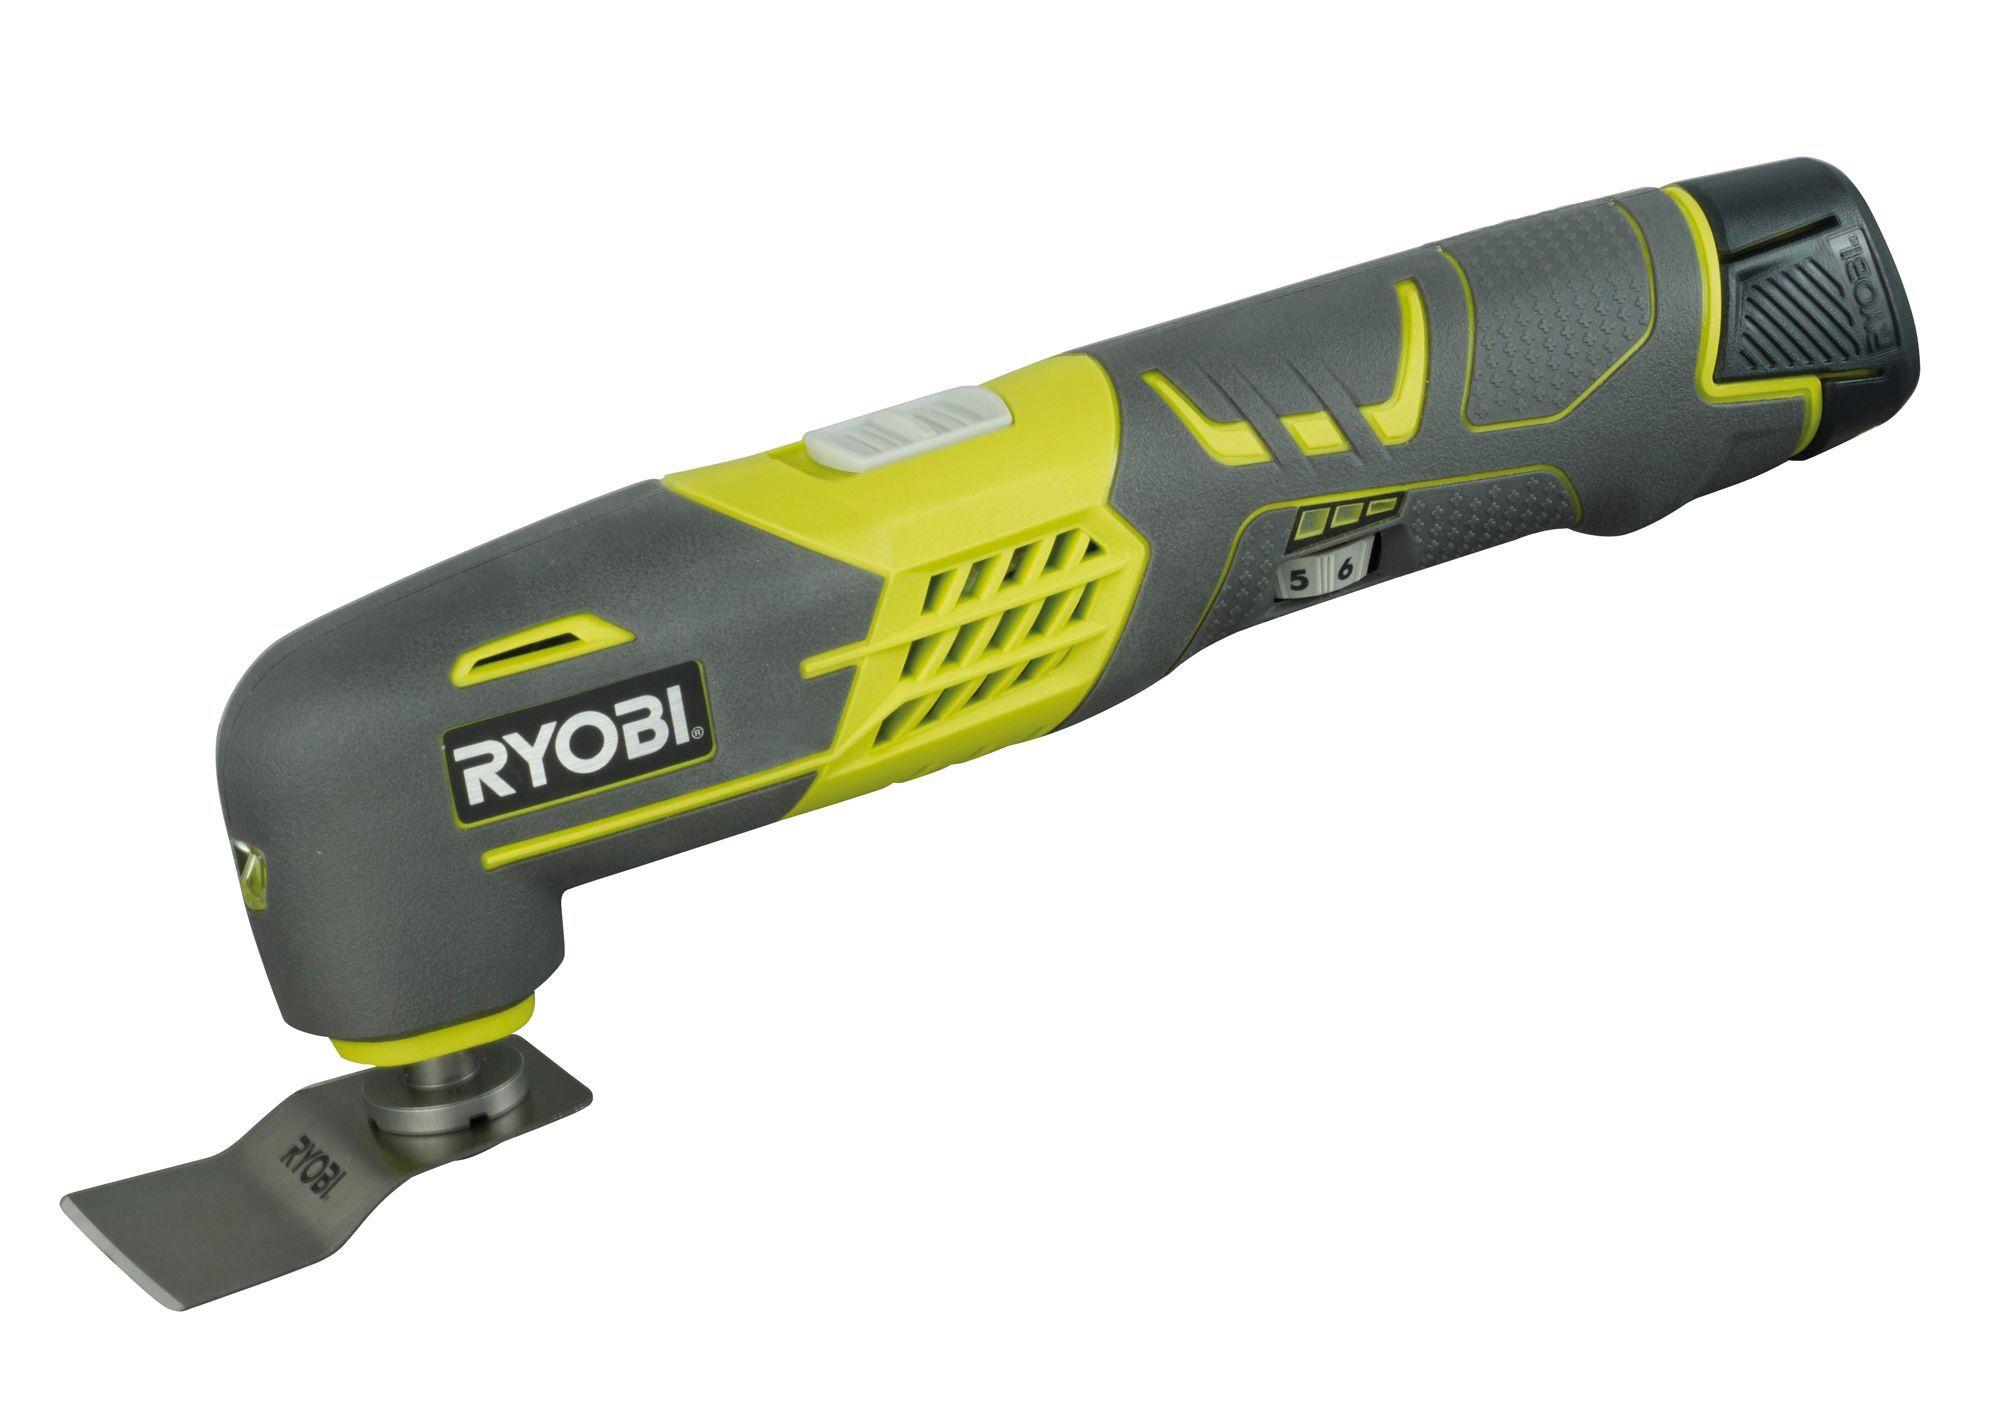 Ryobi 12V Cordless Multi tool RMT12011L   Departments   TradePoint